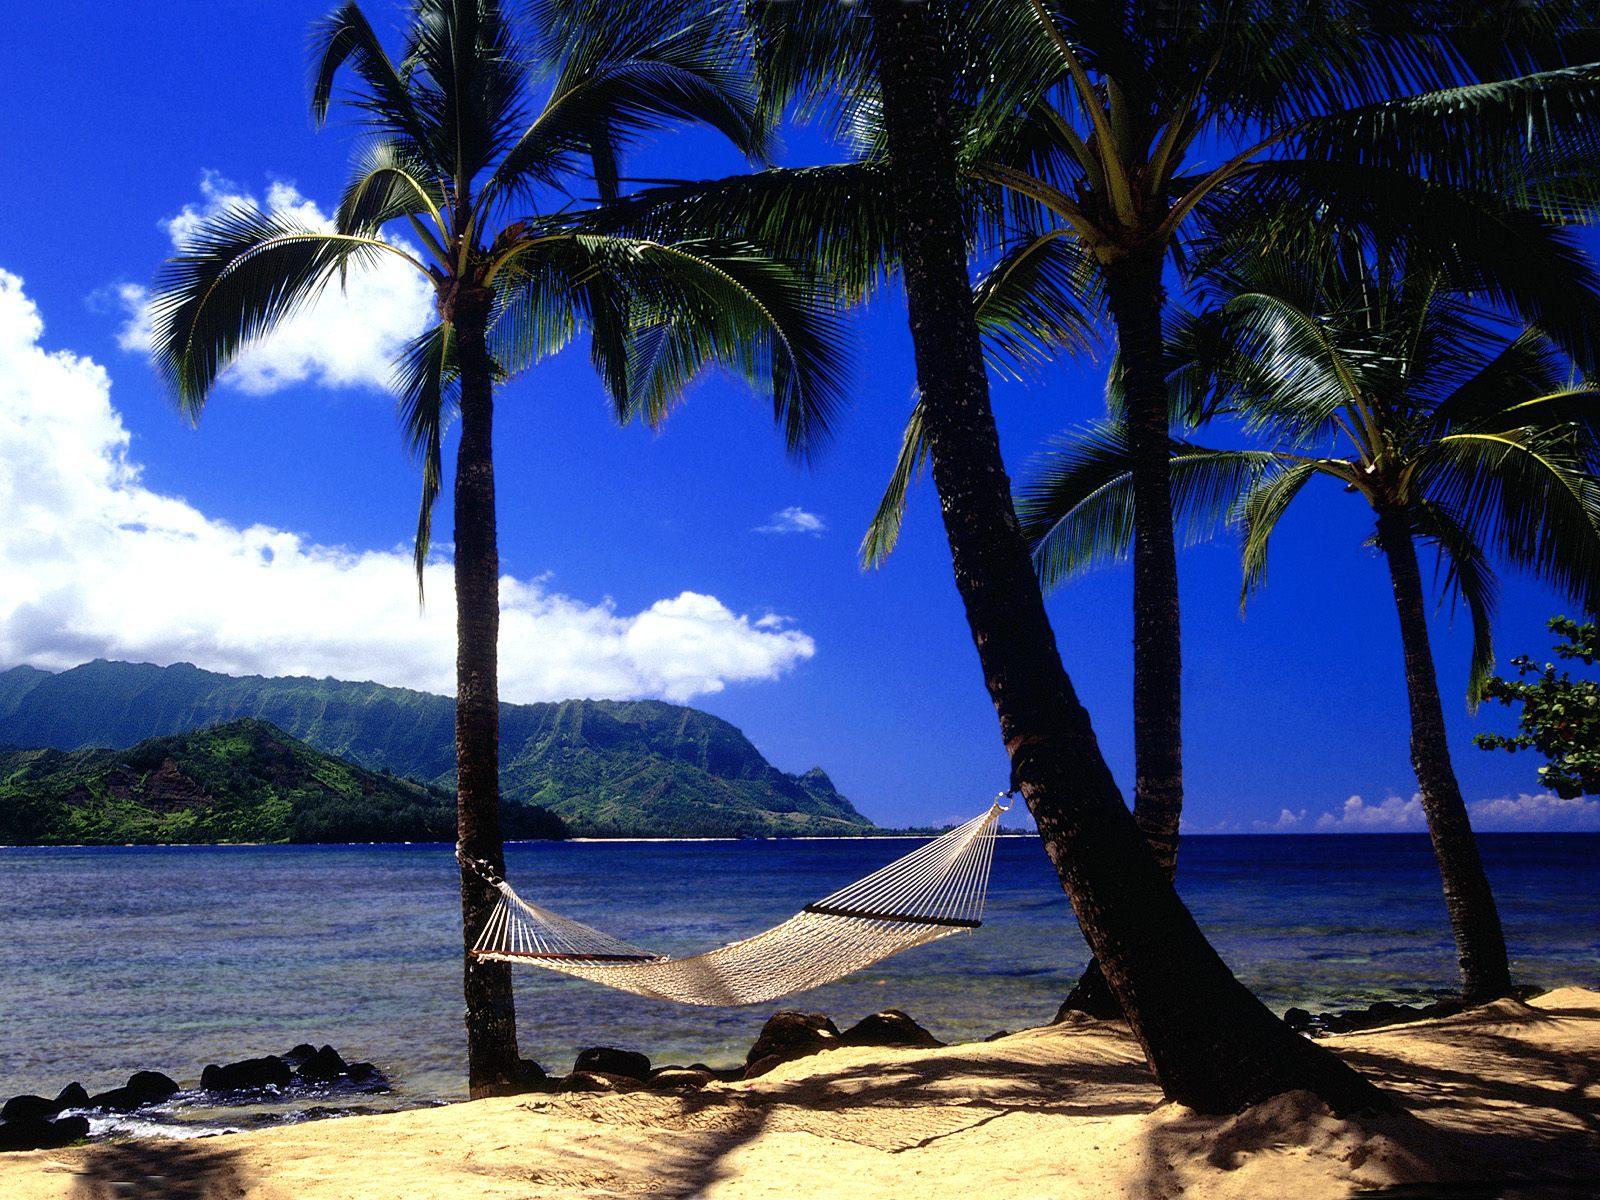 Kauai Hawaii: Travel Trip Journey : Kauai Hawaii